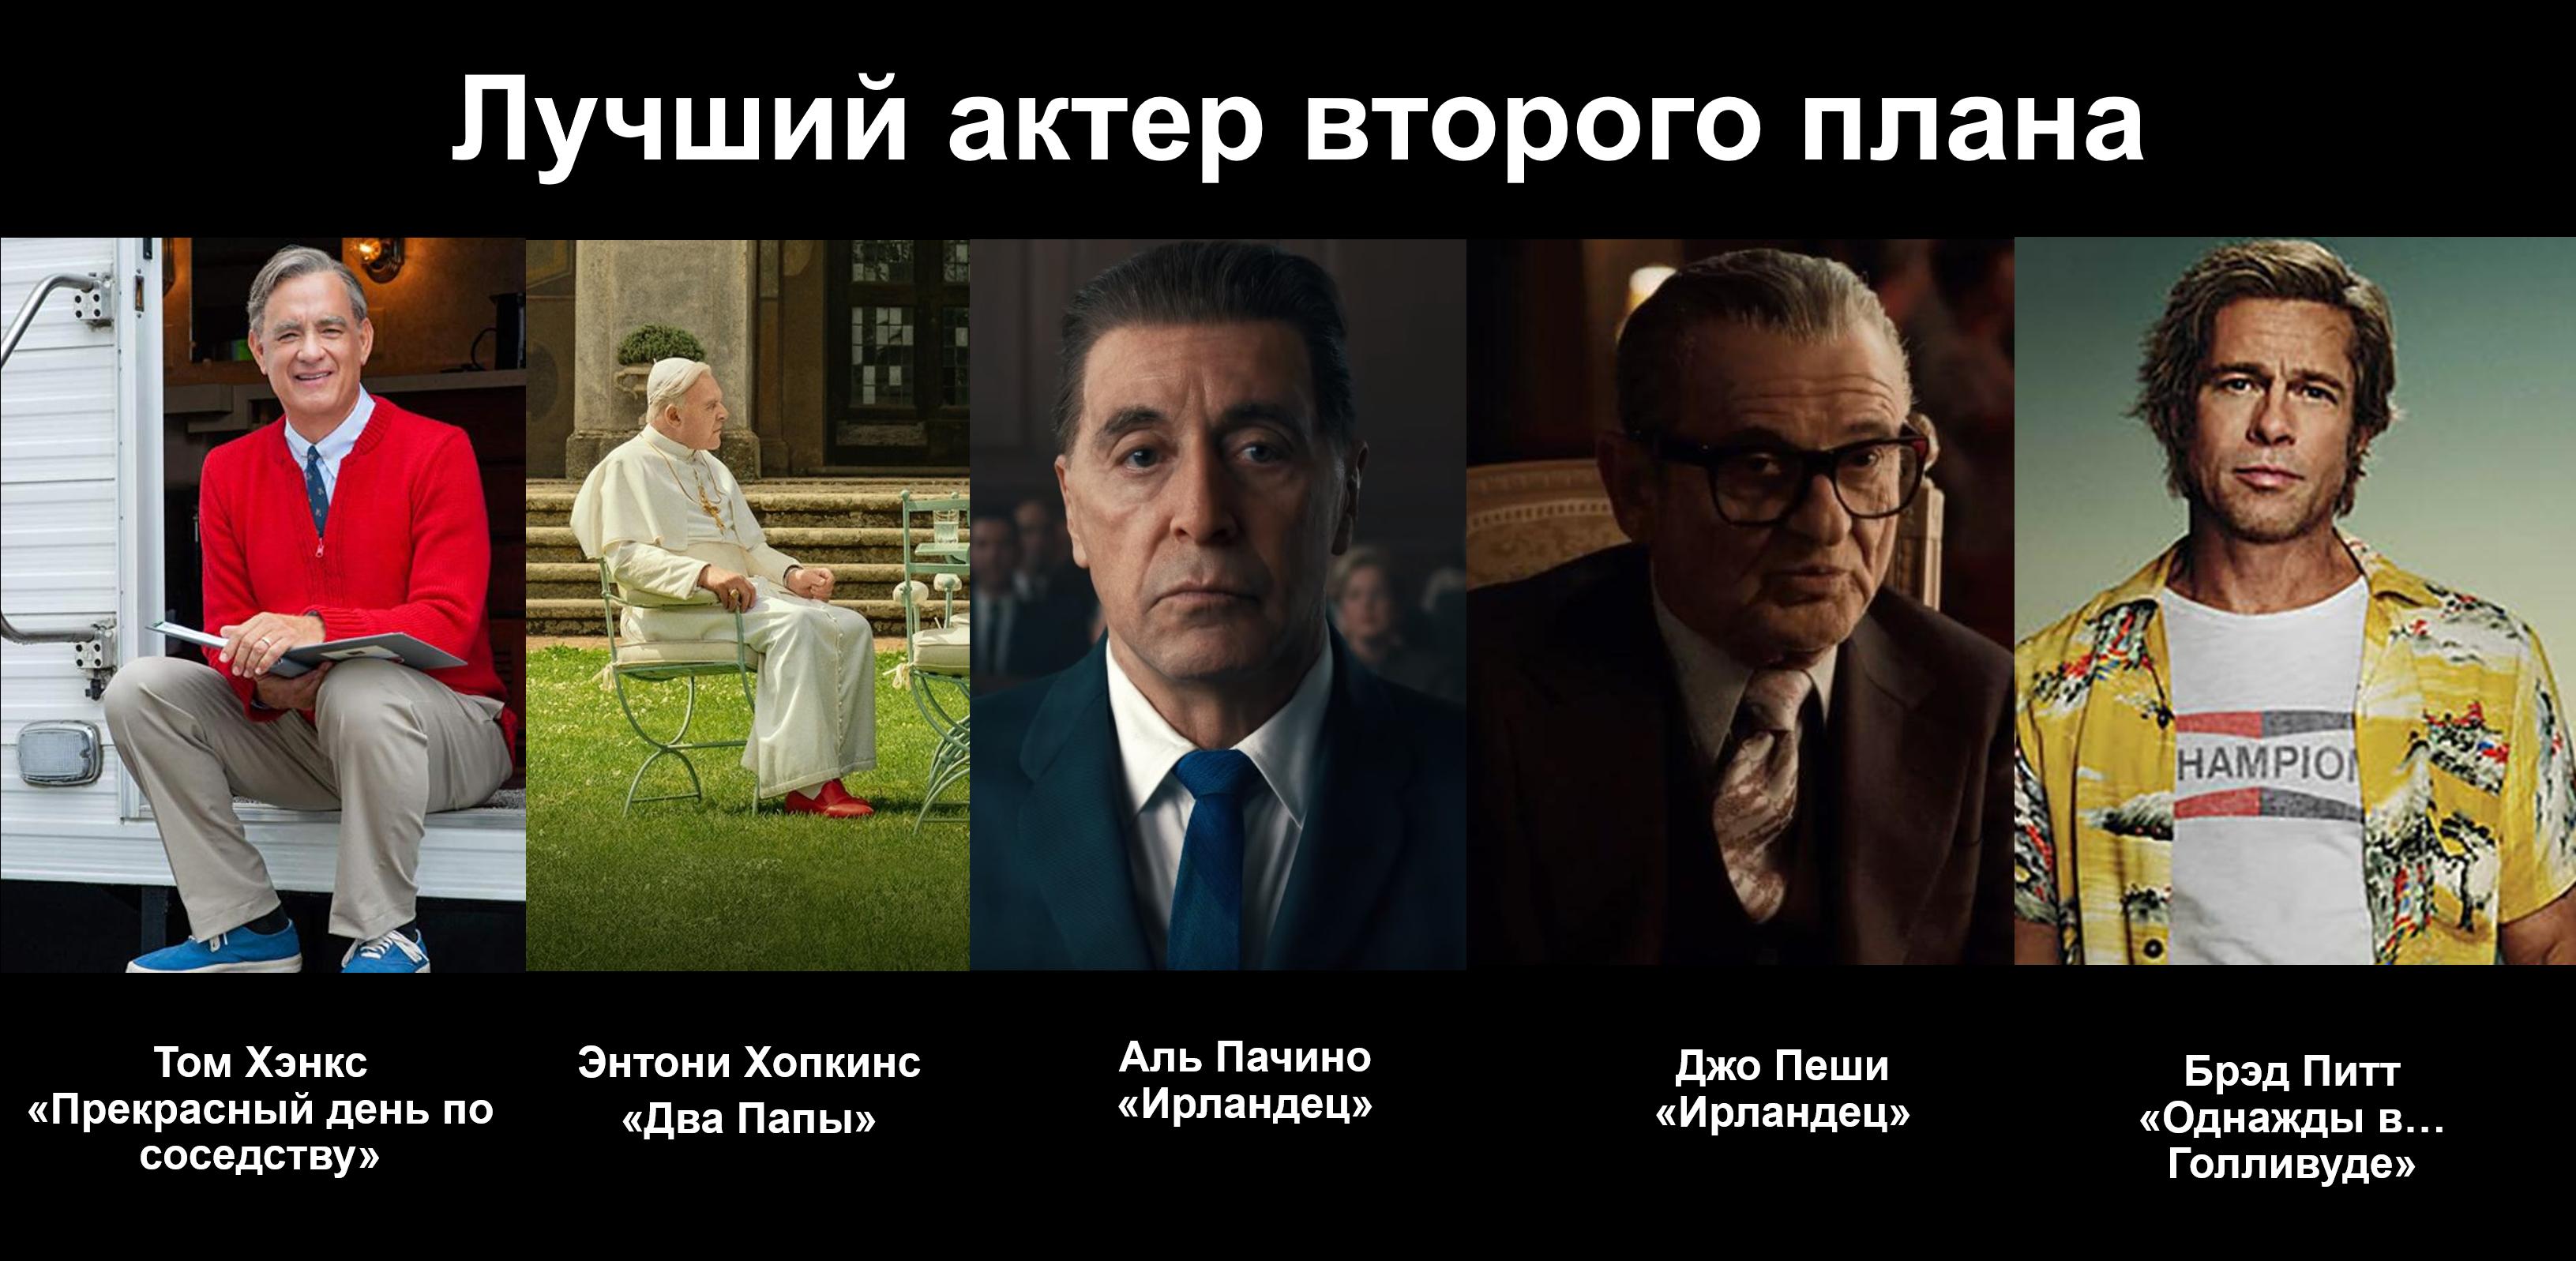 Актер второго плана Оскар 2020